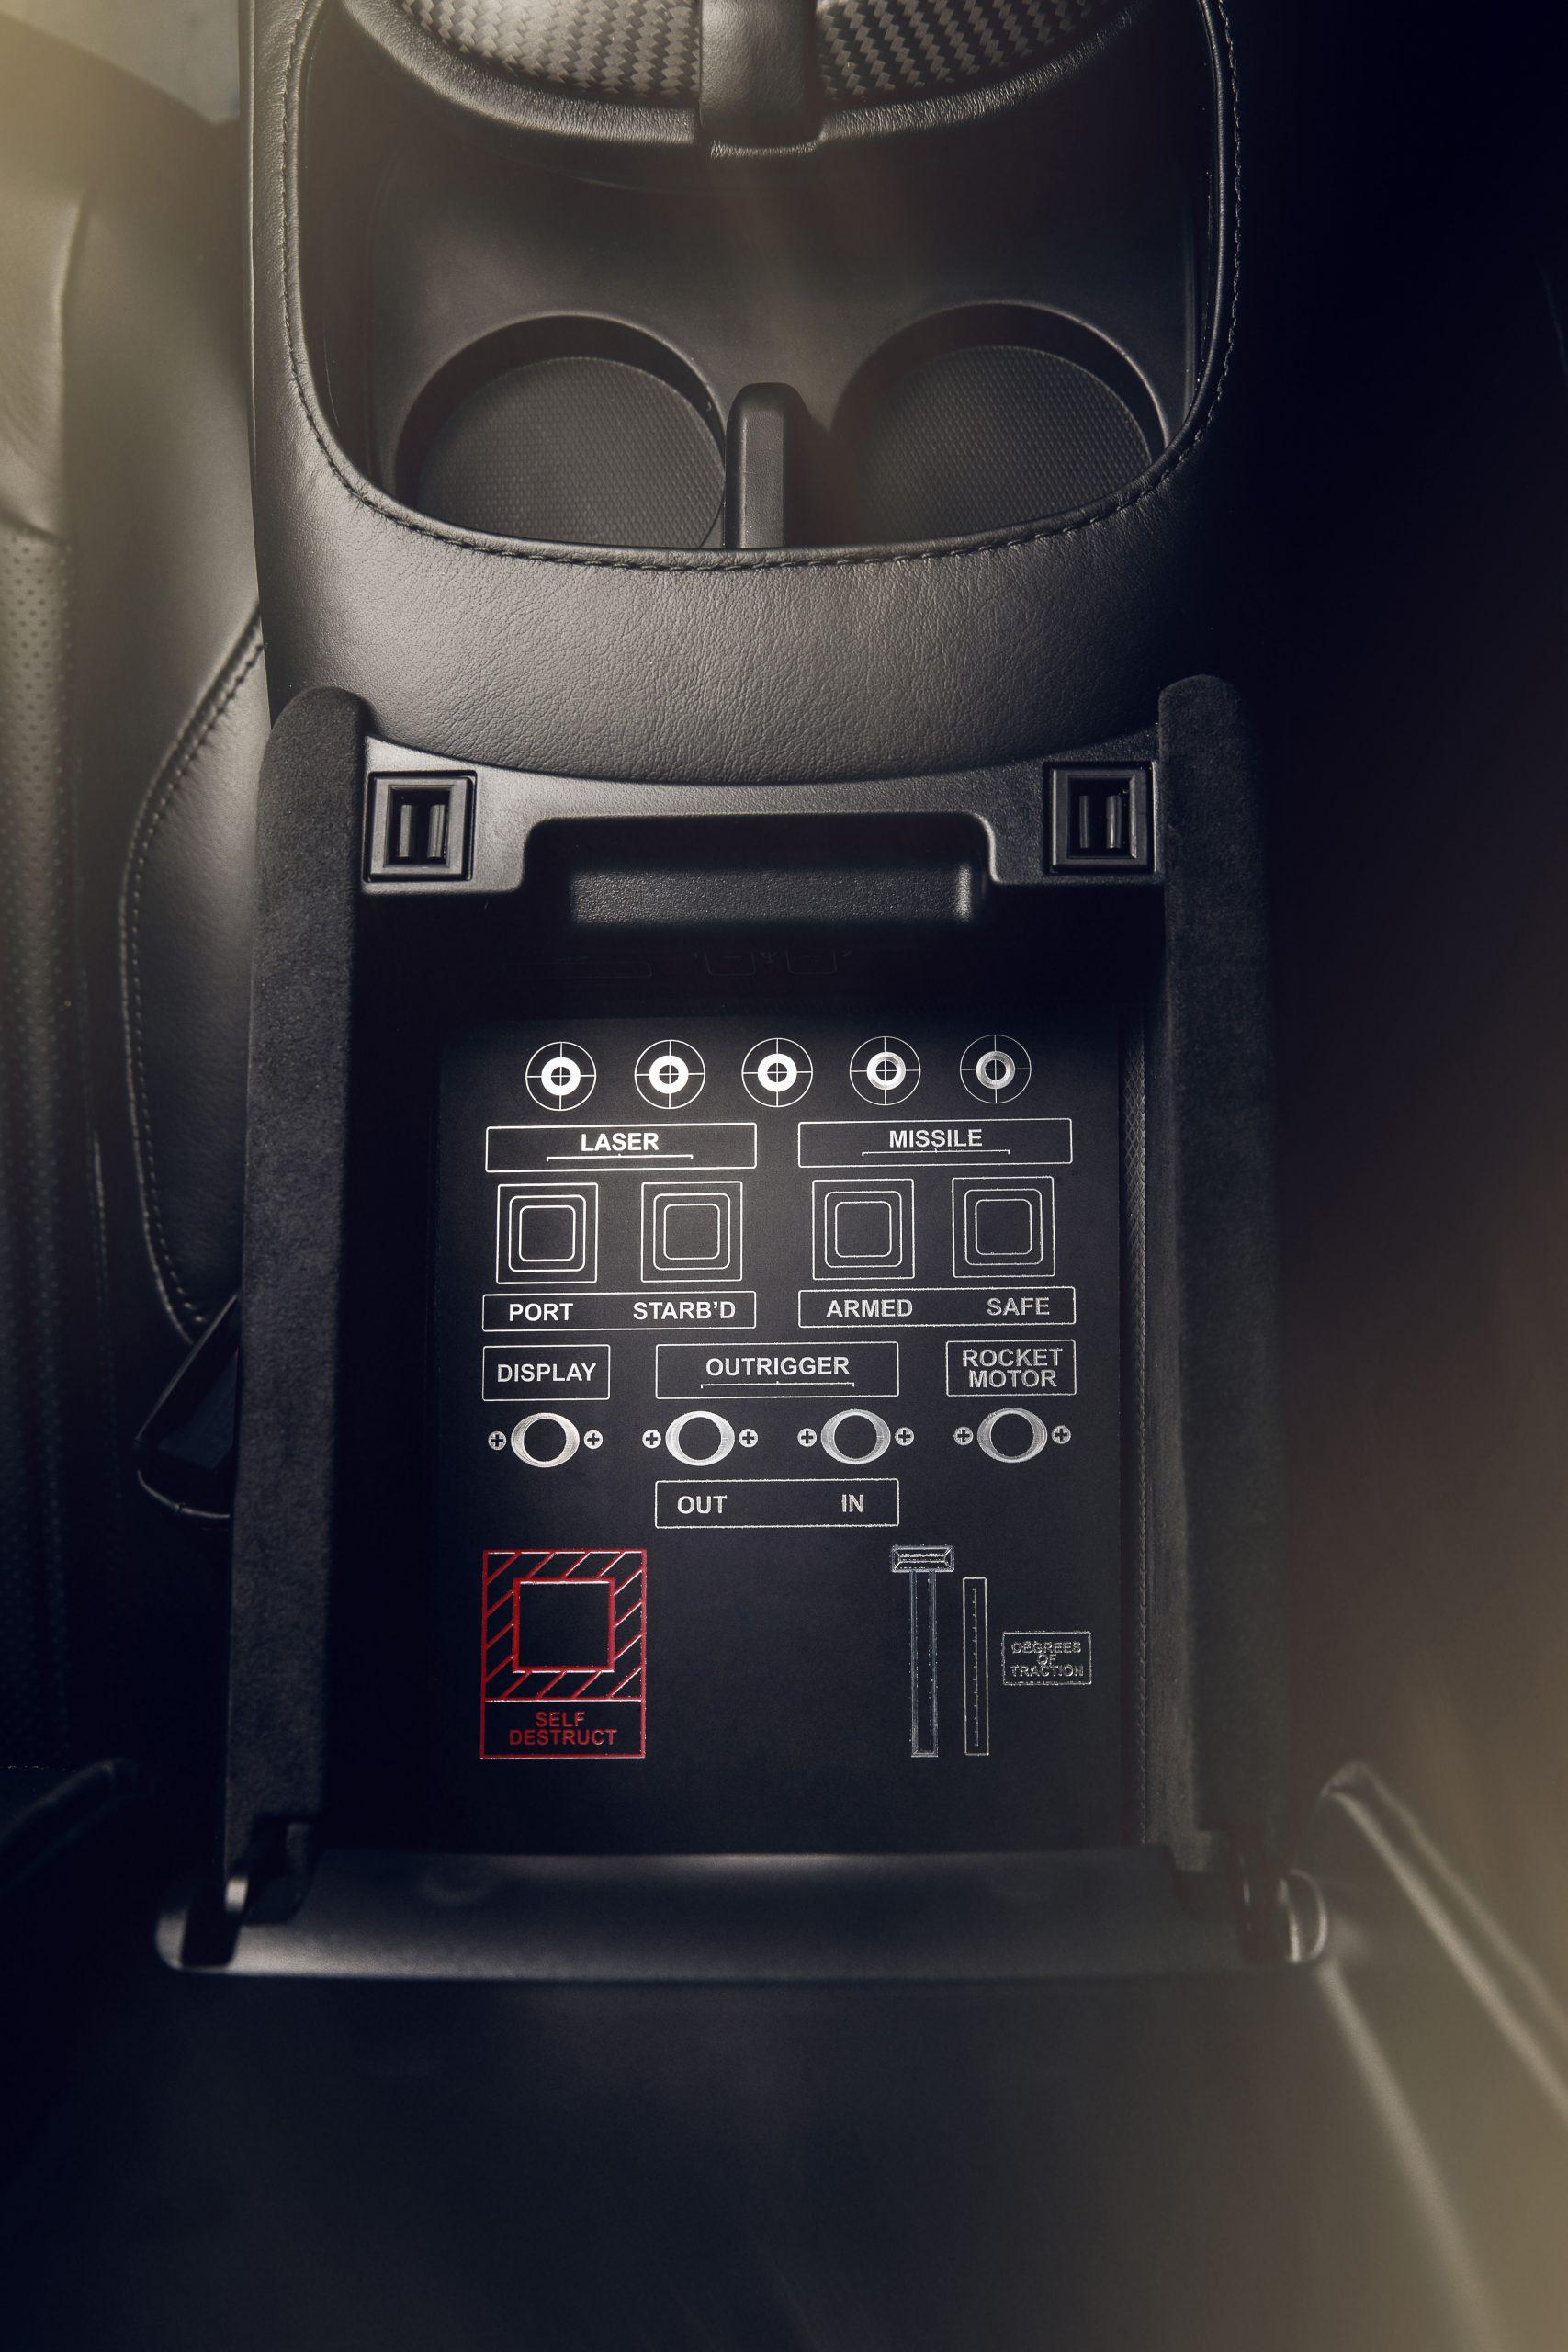 Aston Martin Vantage 007 Edition weapons